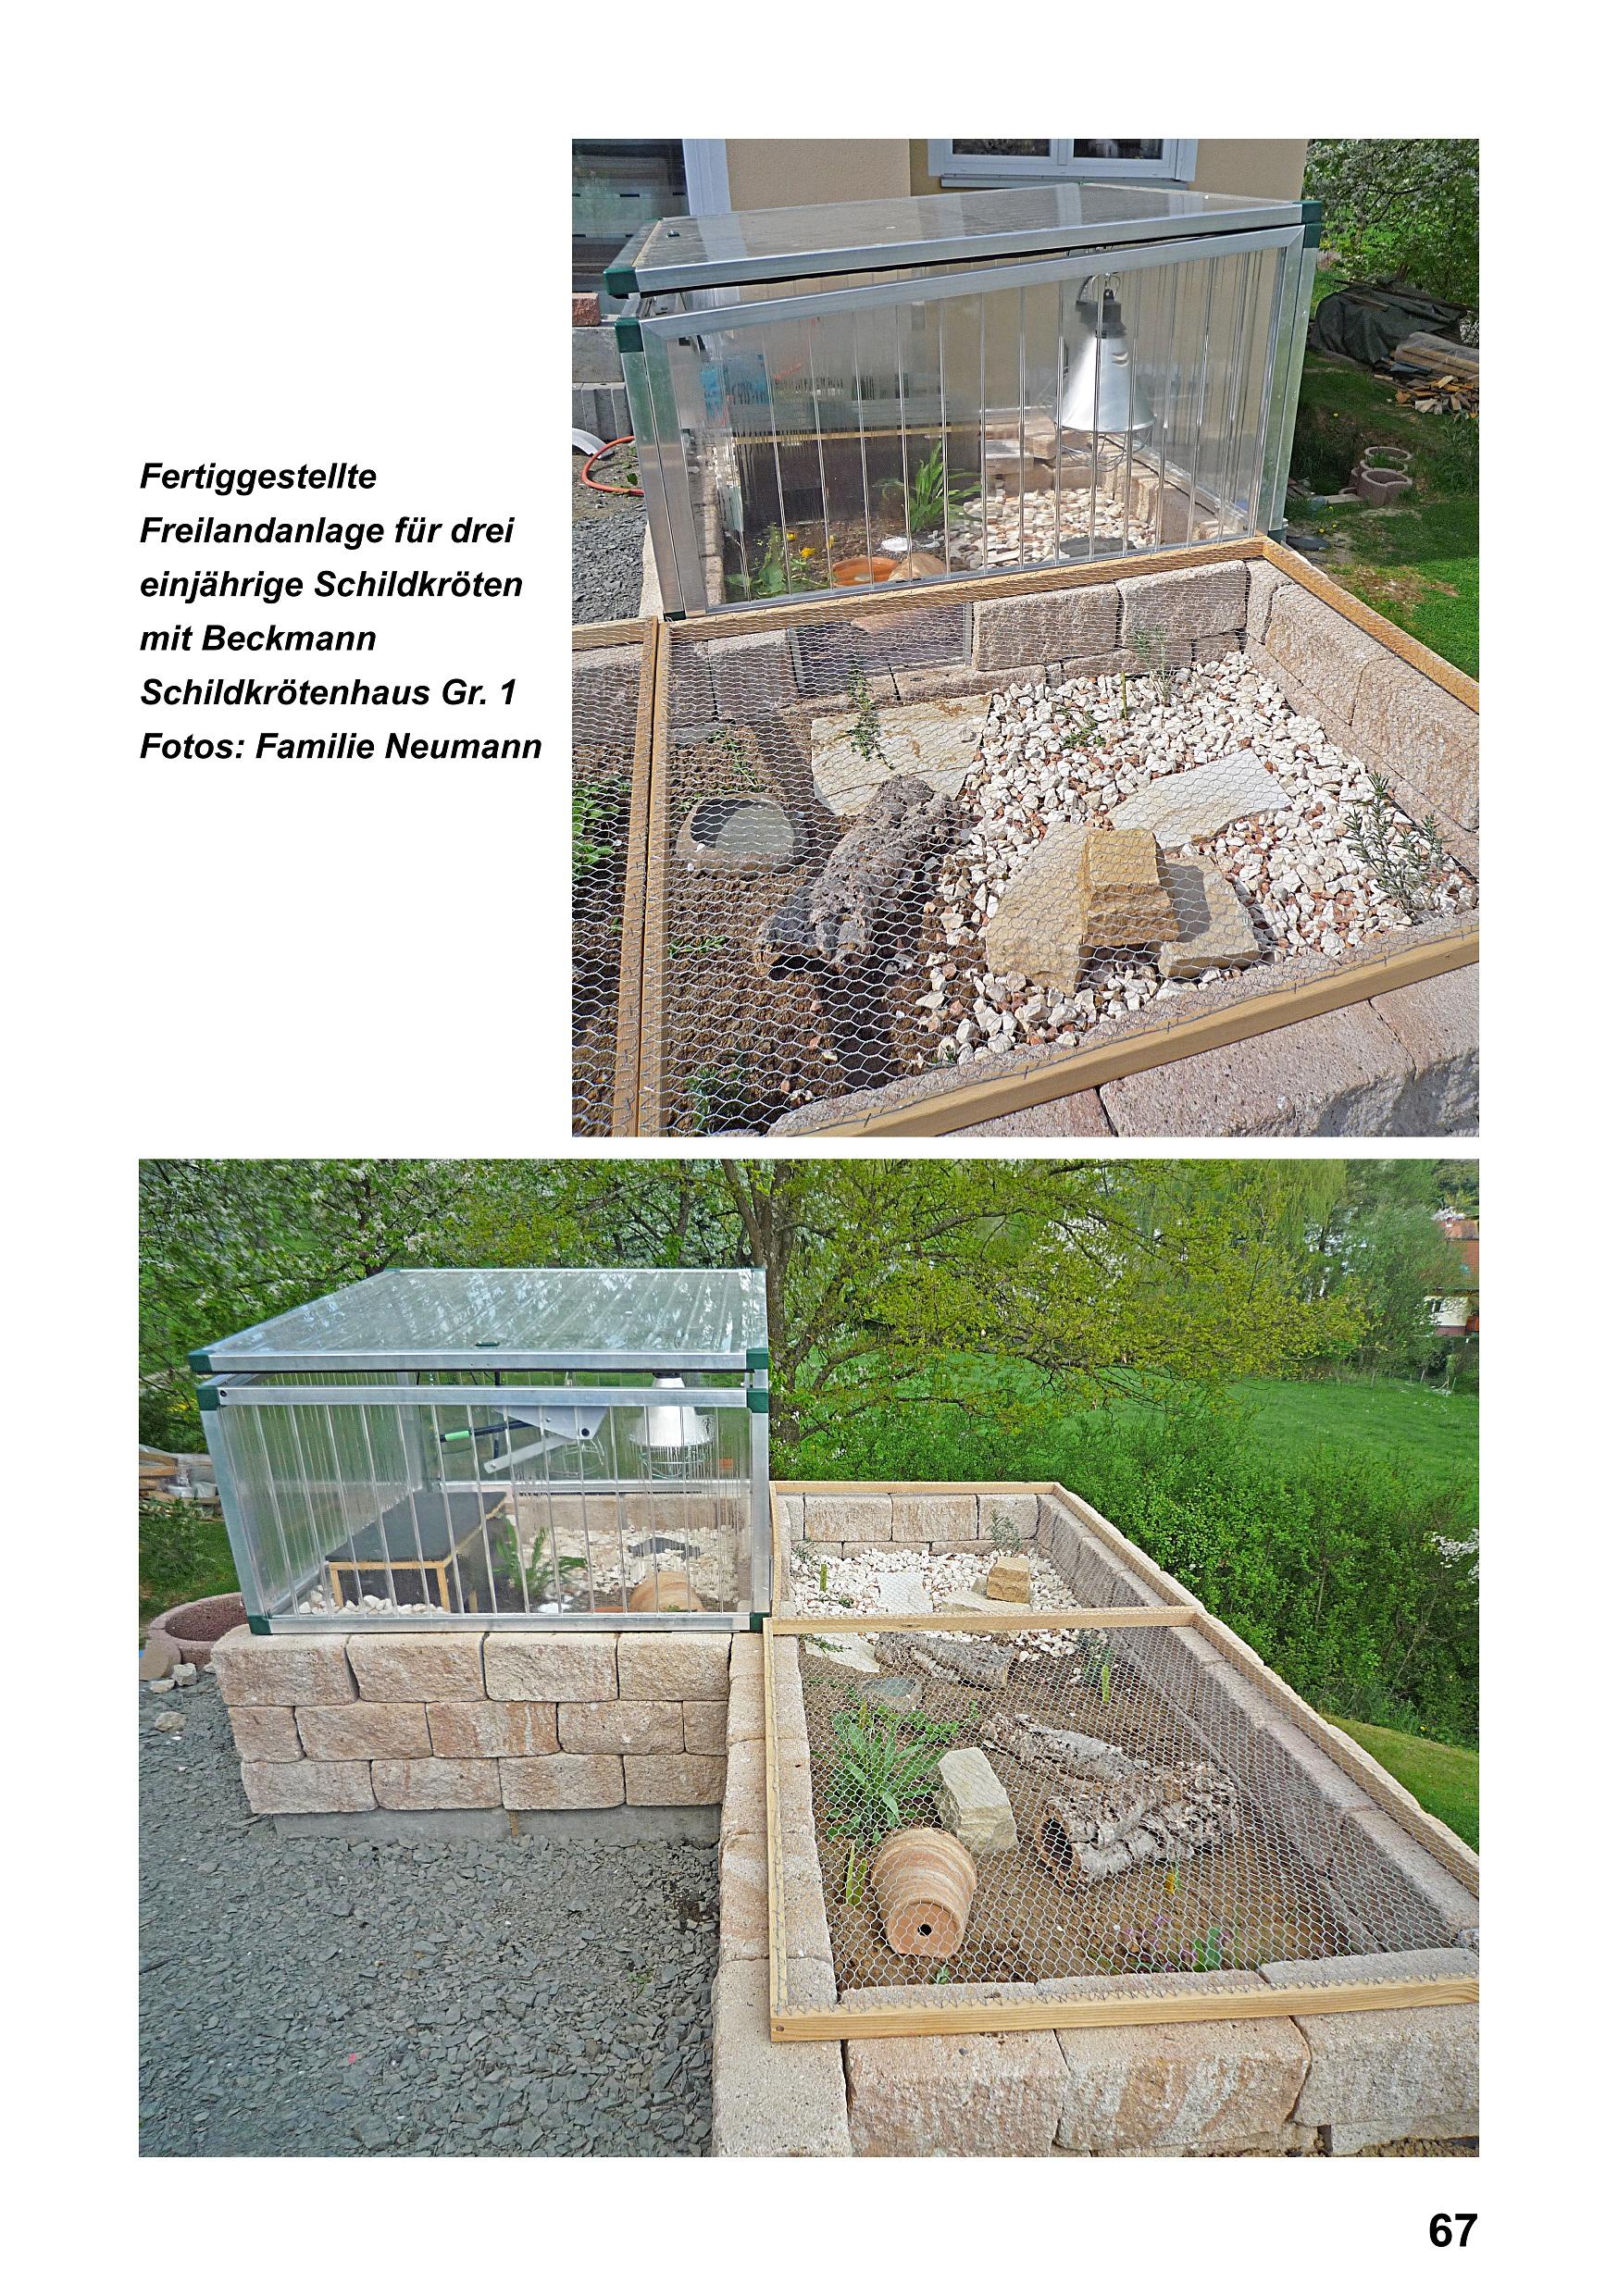 Leseproben: Landschildkröten - Freilandanlagen